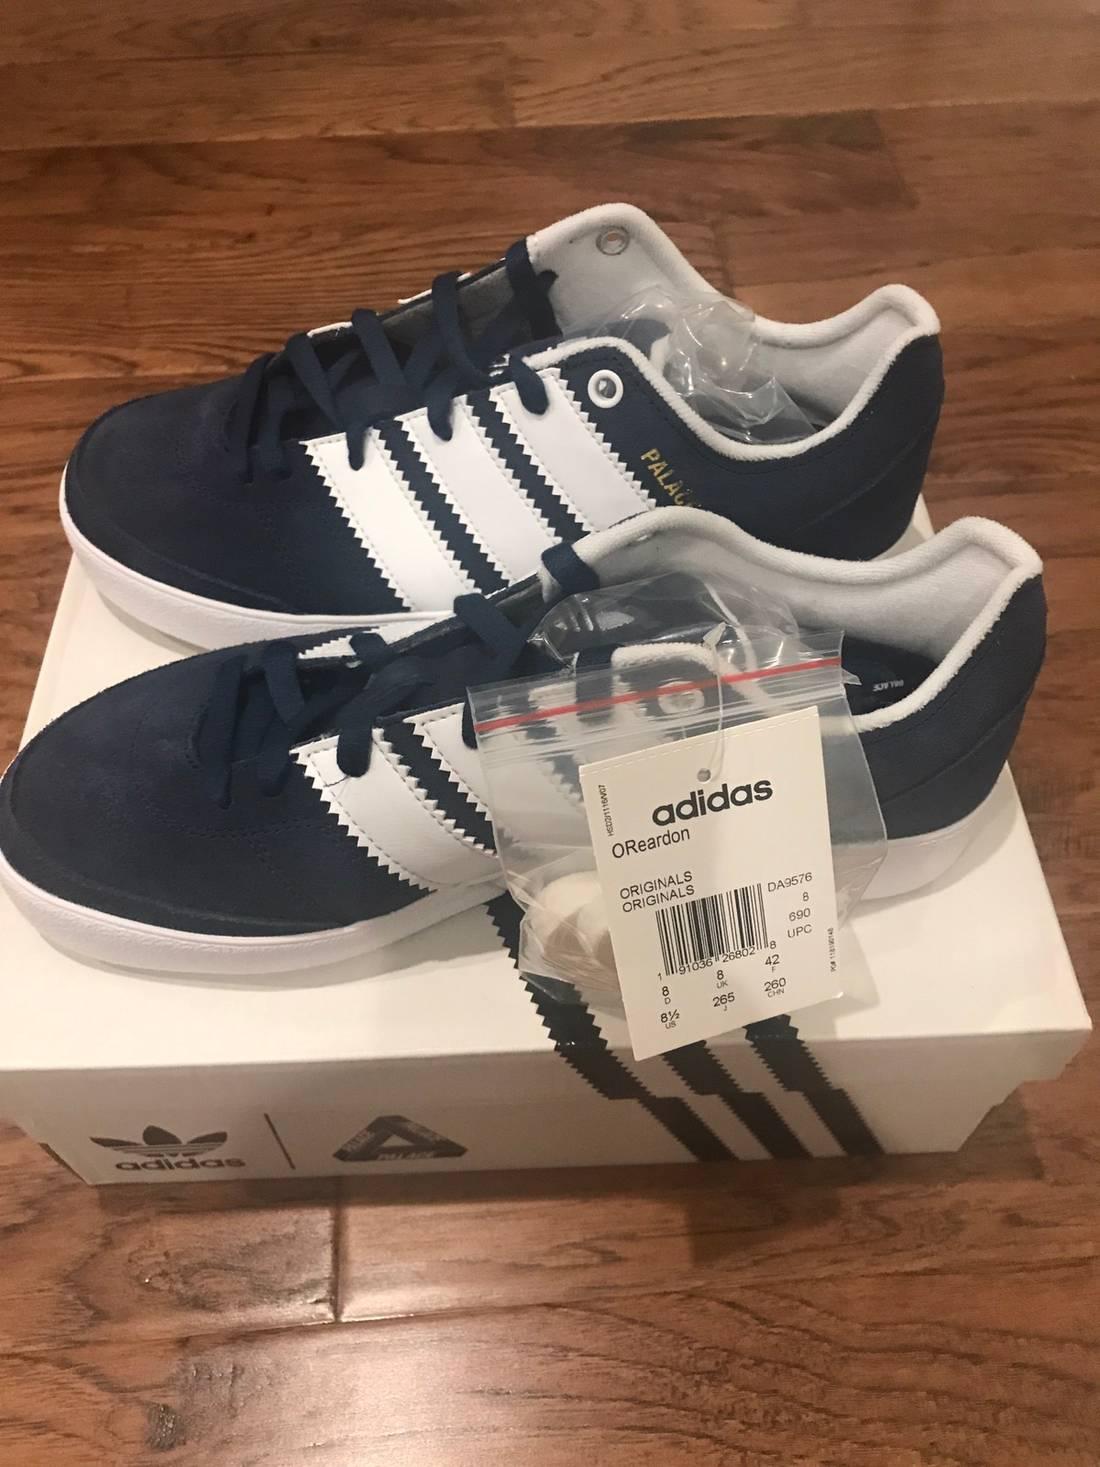 7b0455c2fded Adidas Adidas x Palace OReardon Navy SIZE 8.5 (Brand New) Size . ...